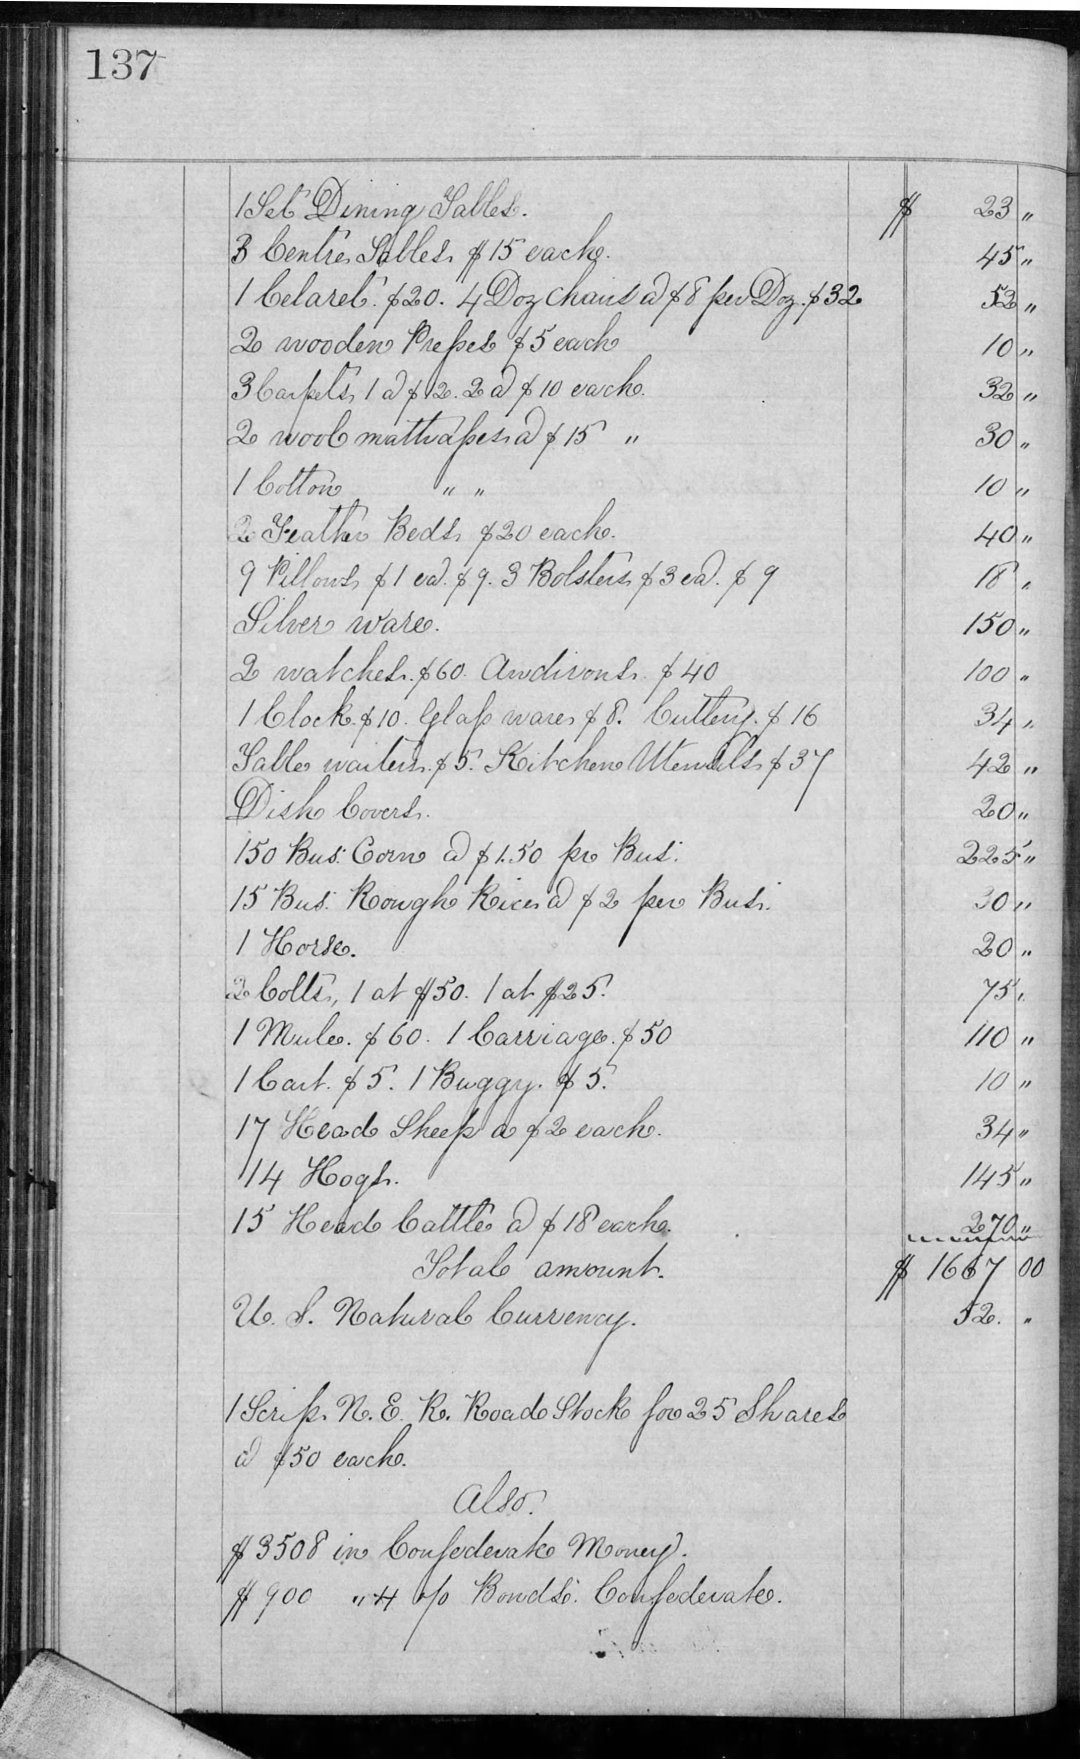 Porcher John P Est Inv Book G (1864-67) p137